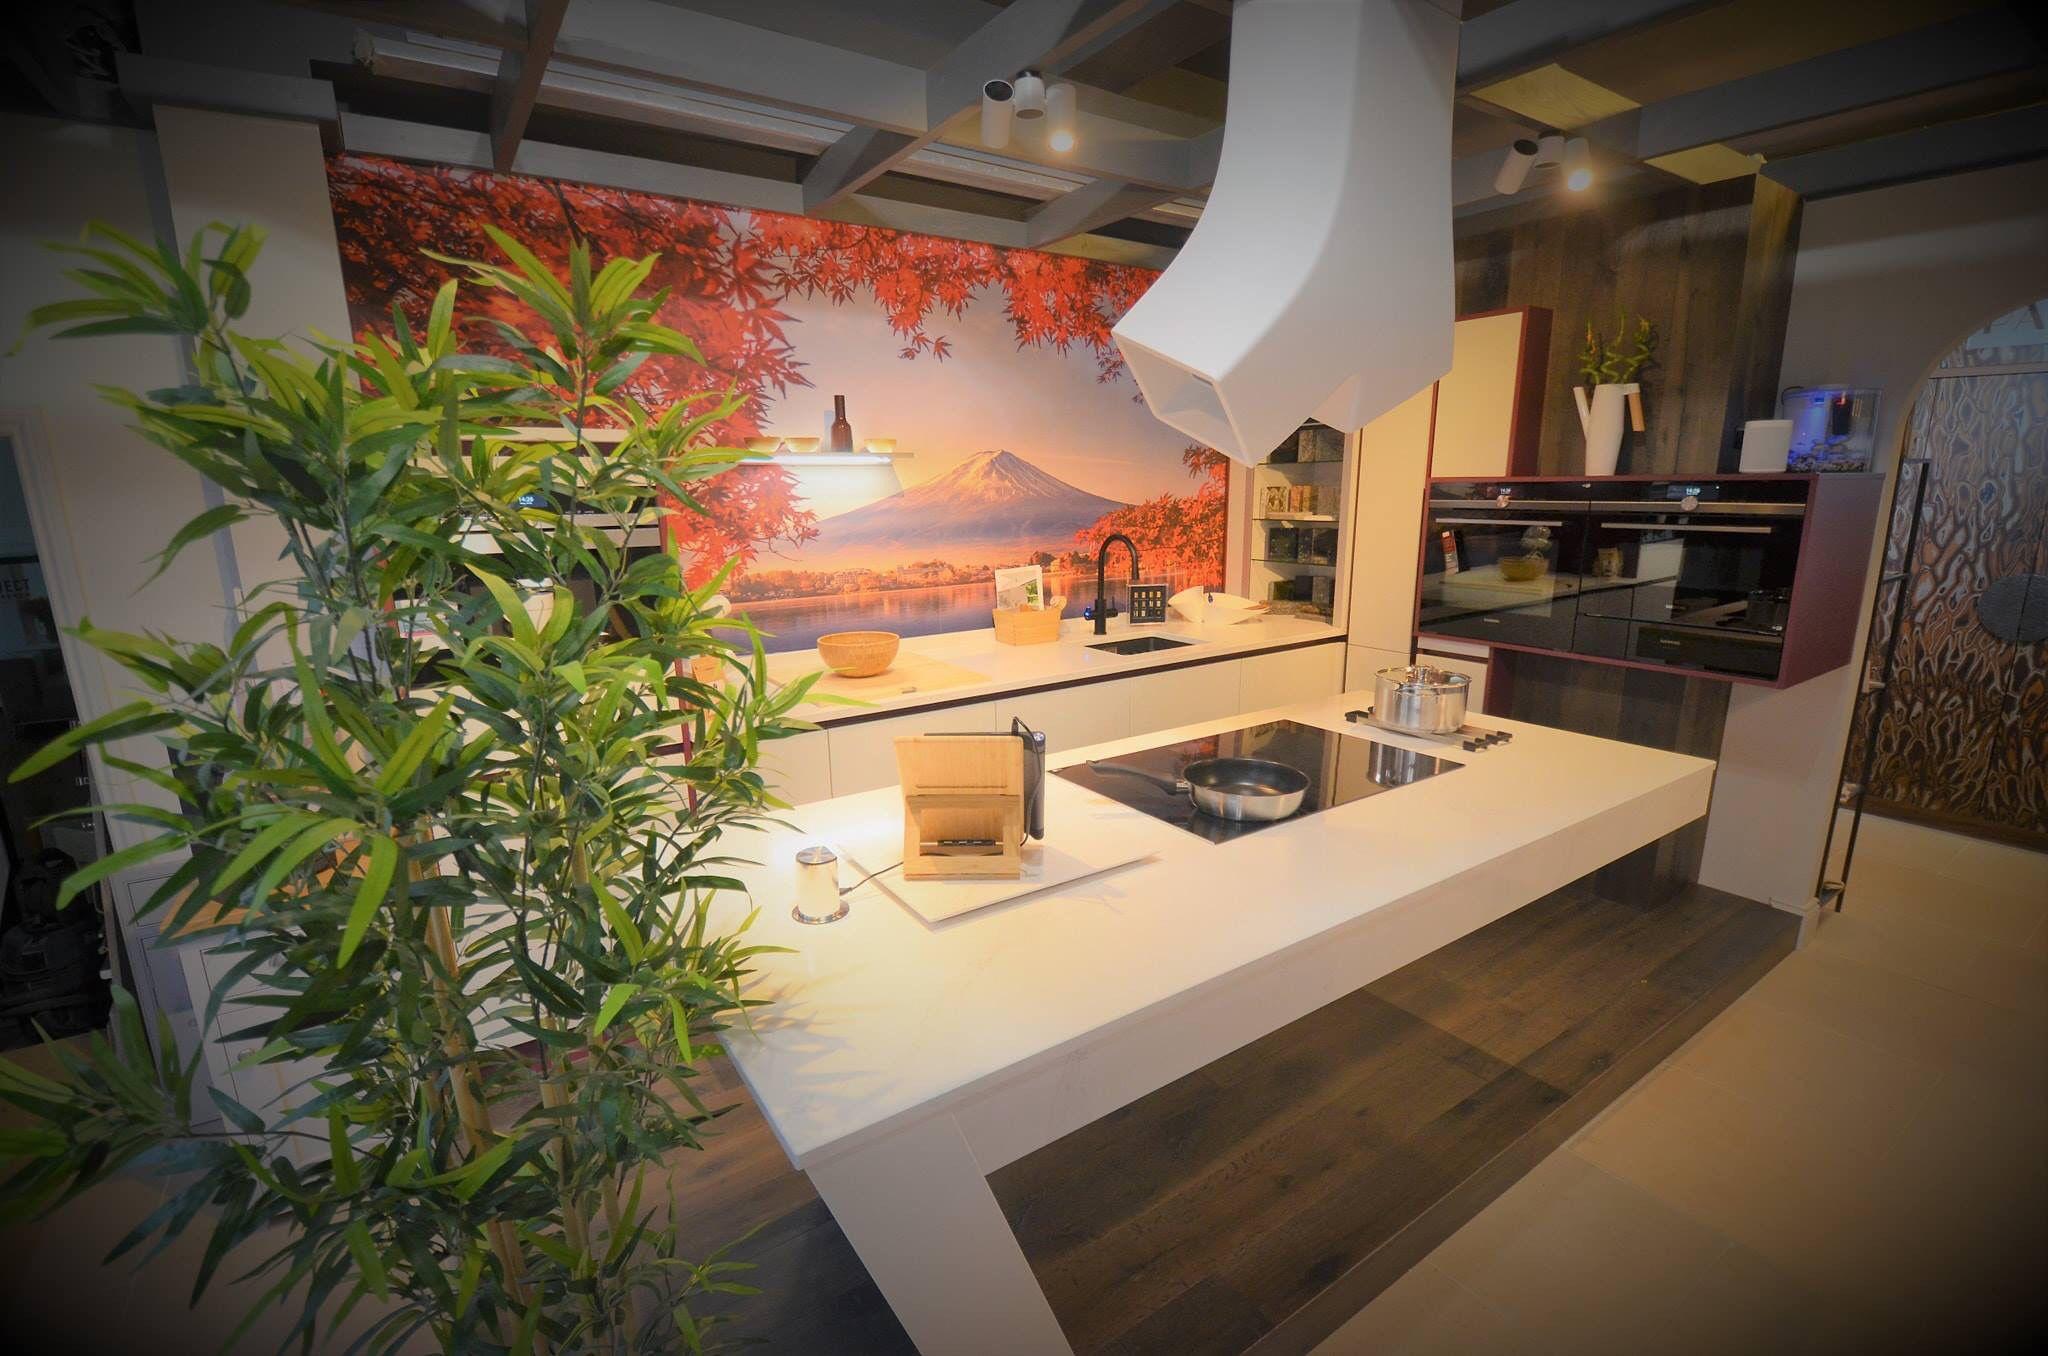 studio 10 kitchens kitchen inspiration modern modern interior design japanese interior design on kitchen interior japan id=43803